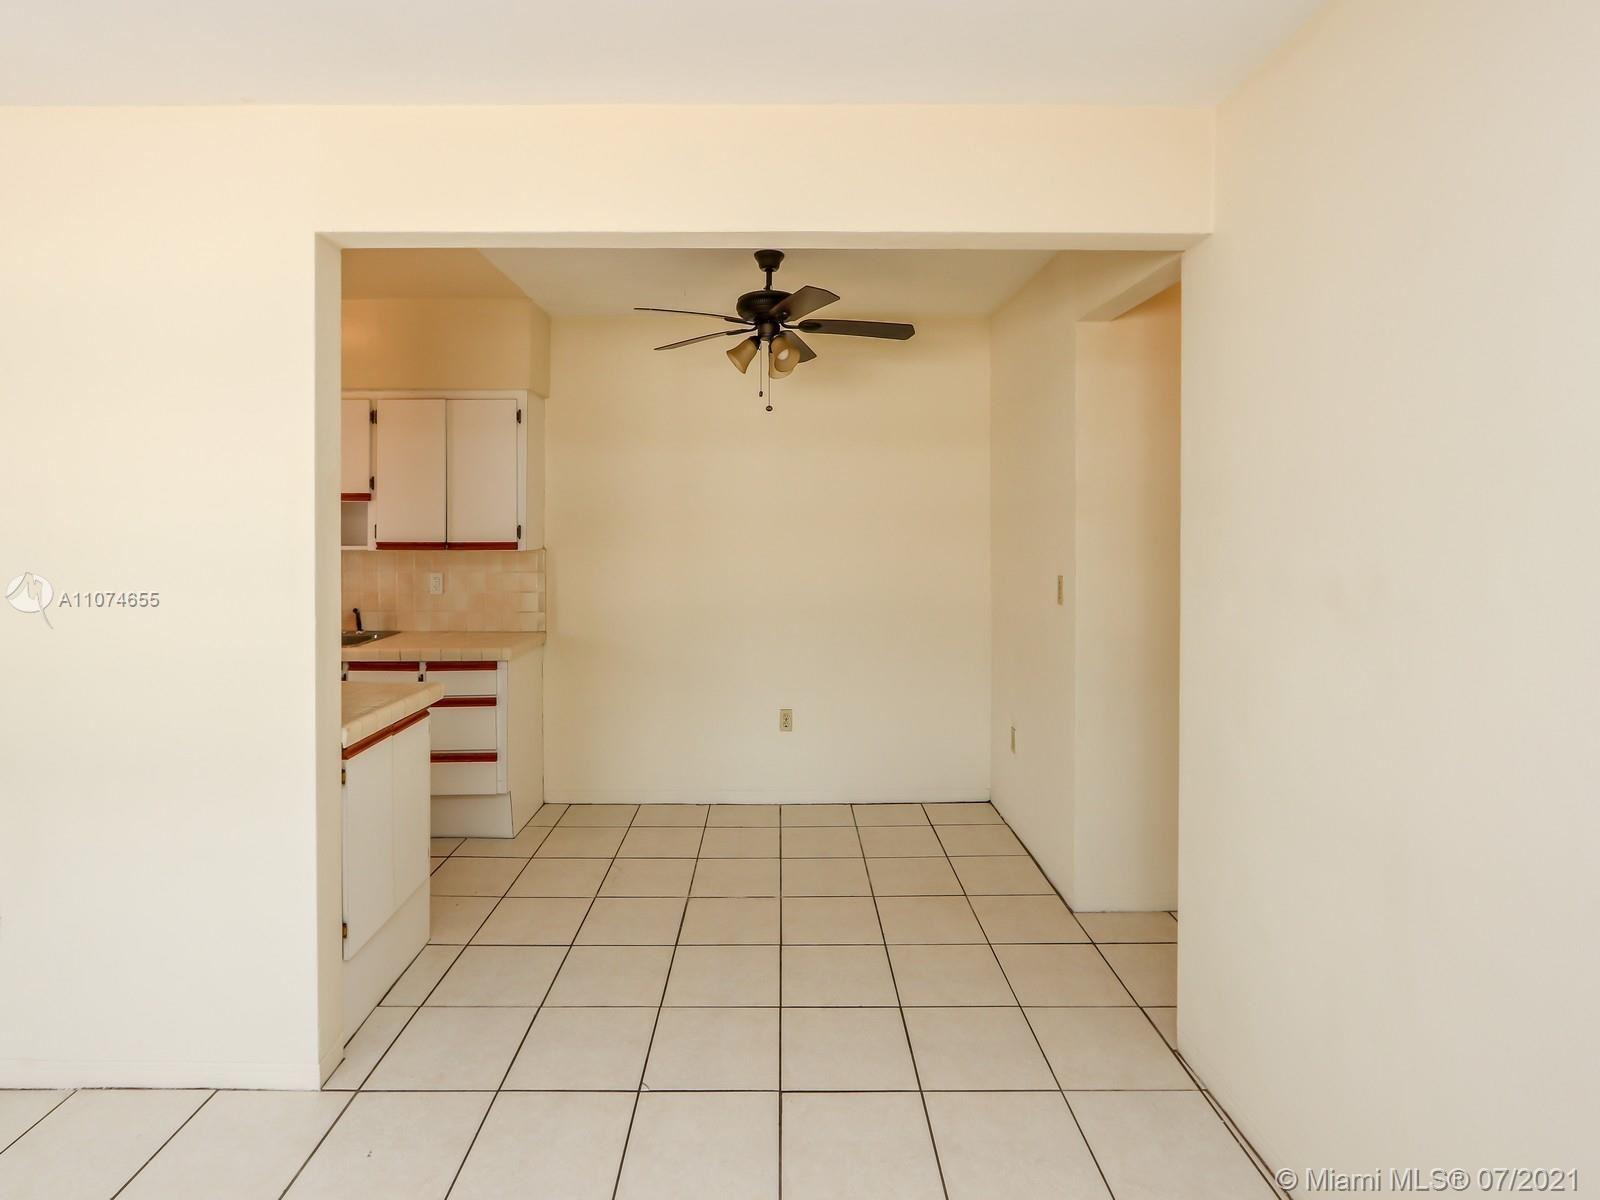 Photo of 1250 S Alhambra Cir #17, Coral Gables, FL 33146 (MLS # A11074655)